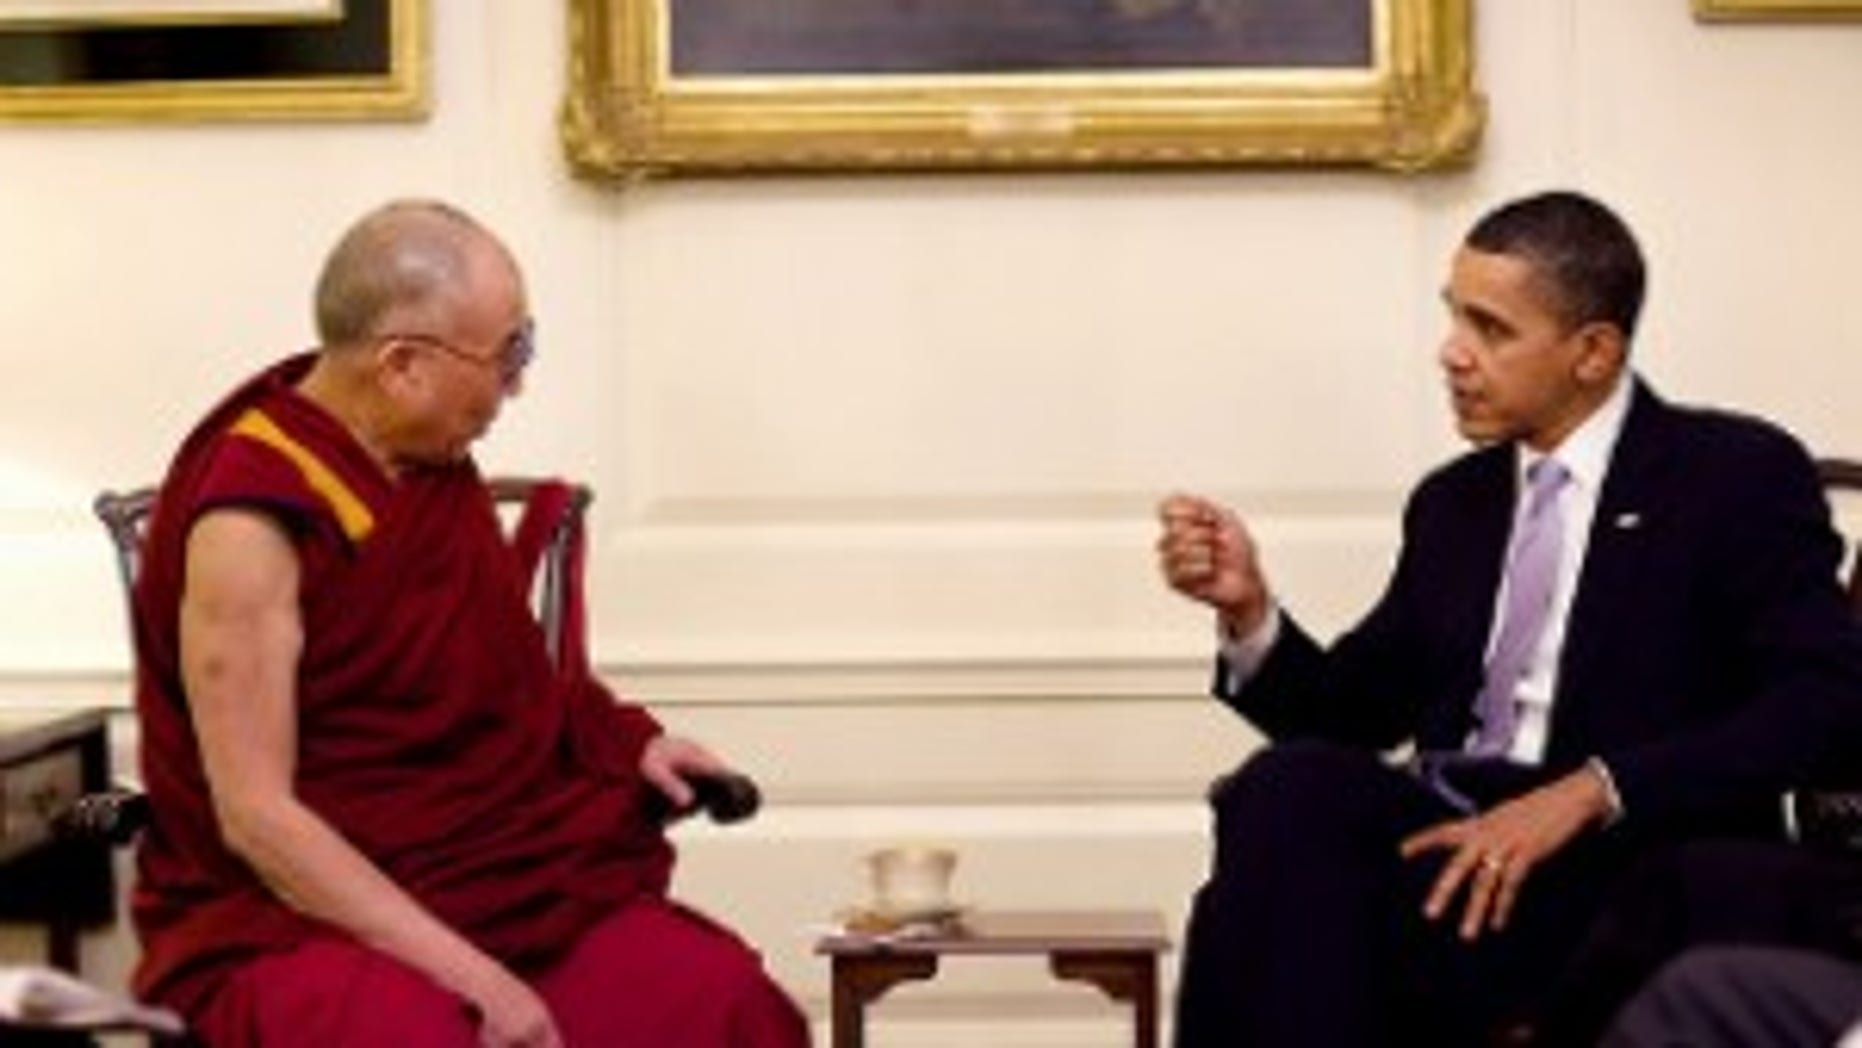 President Obama meets with the Dalai Lama. White House Photo.